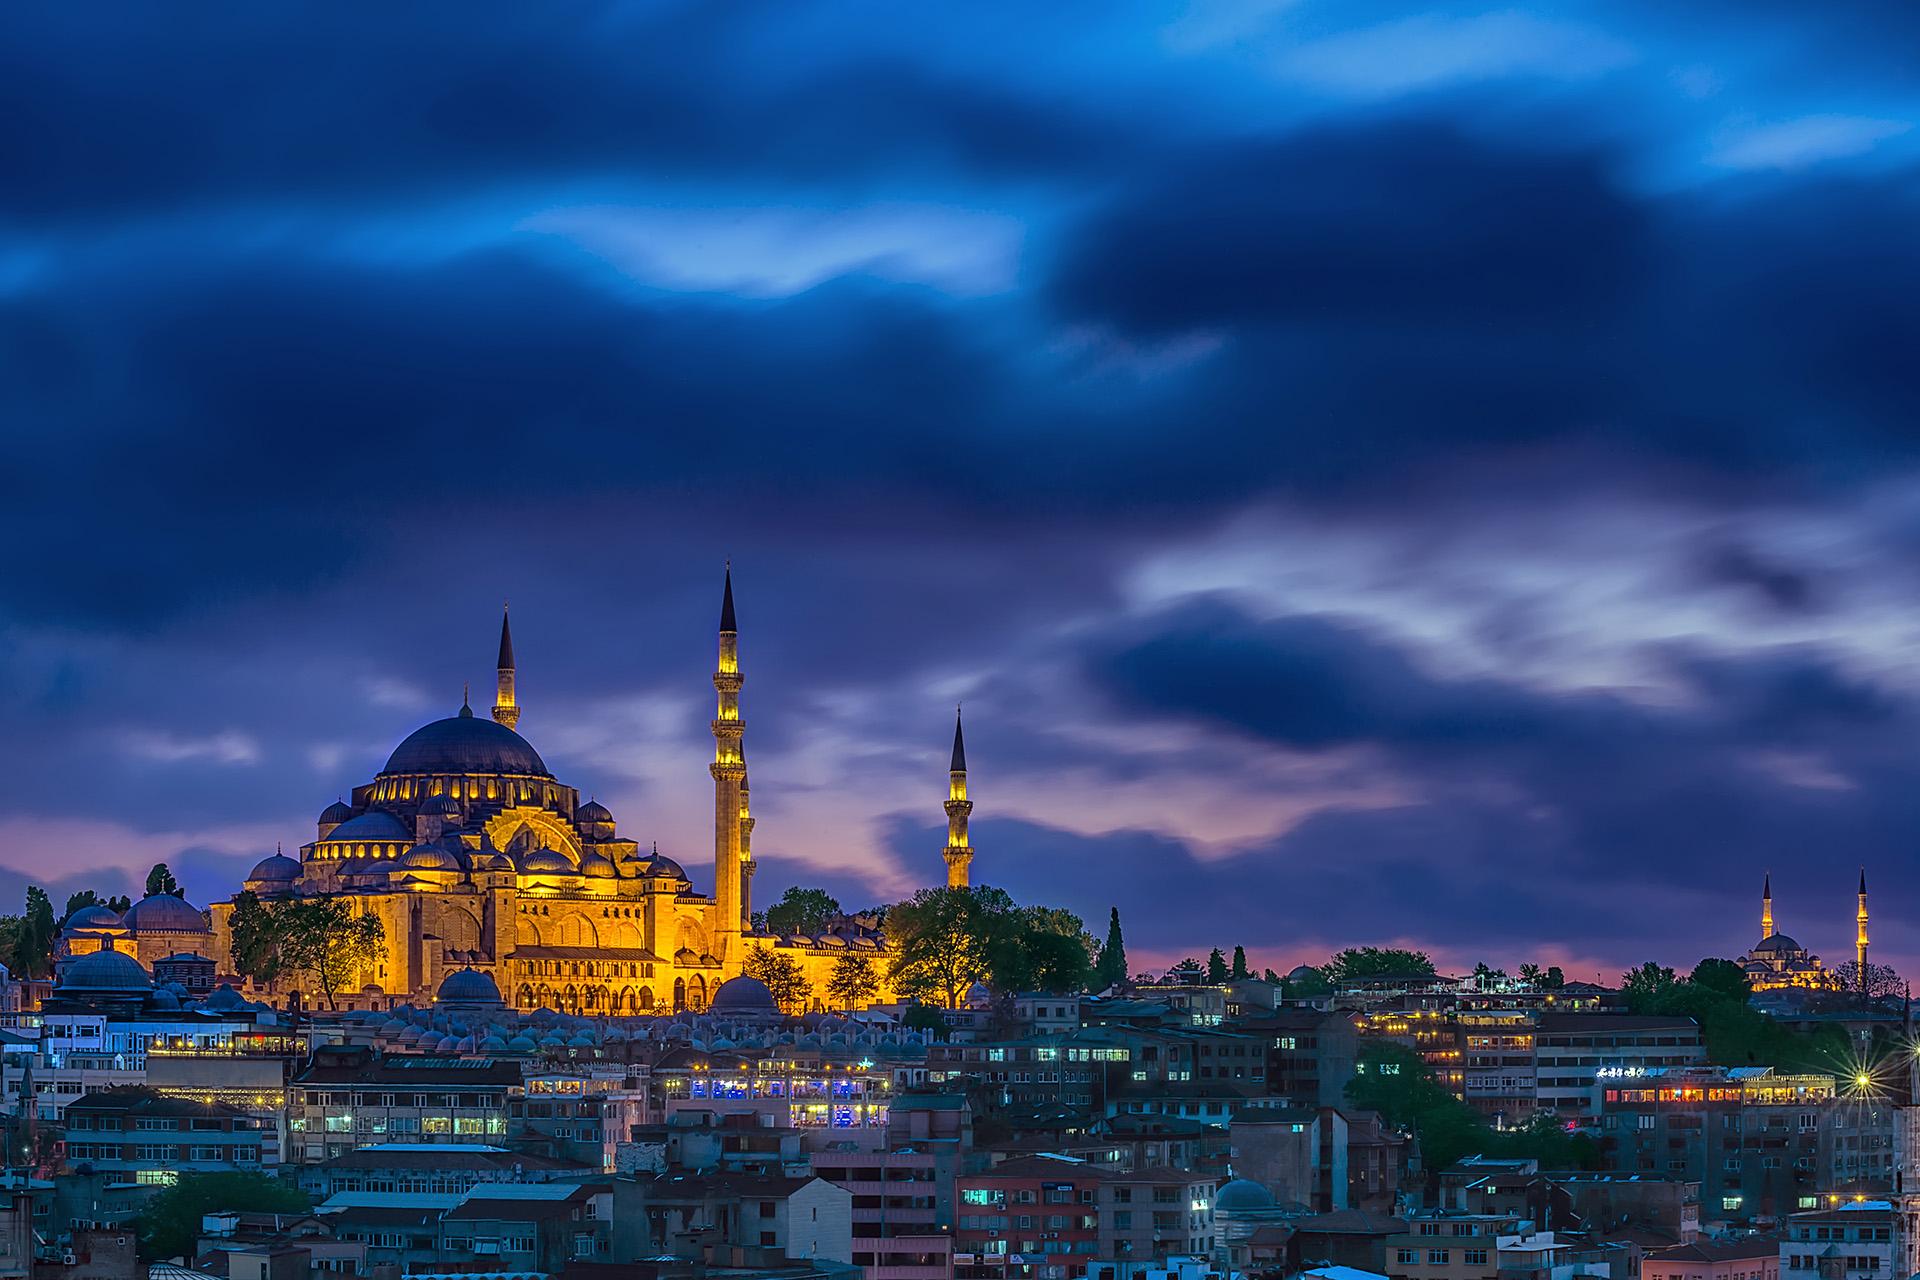 26bc631b 18a5 403a 8e61 e2bdc1449010 - تور استانبول در 24 ساعت